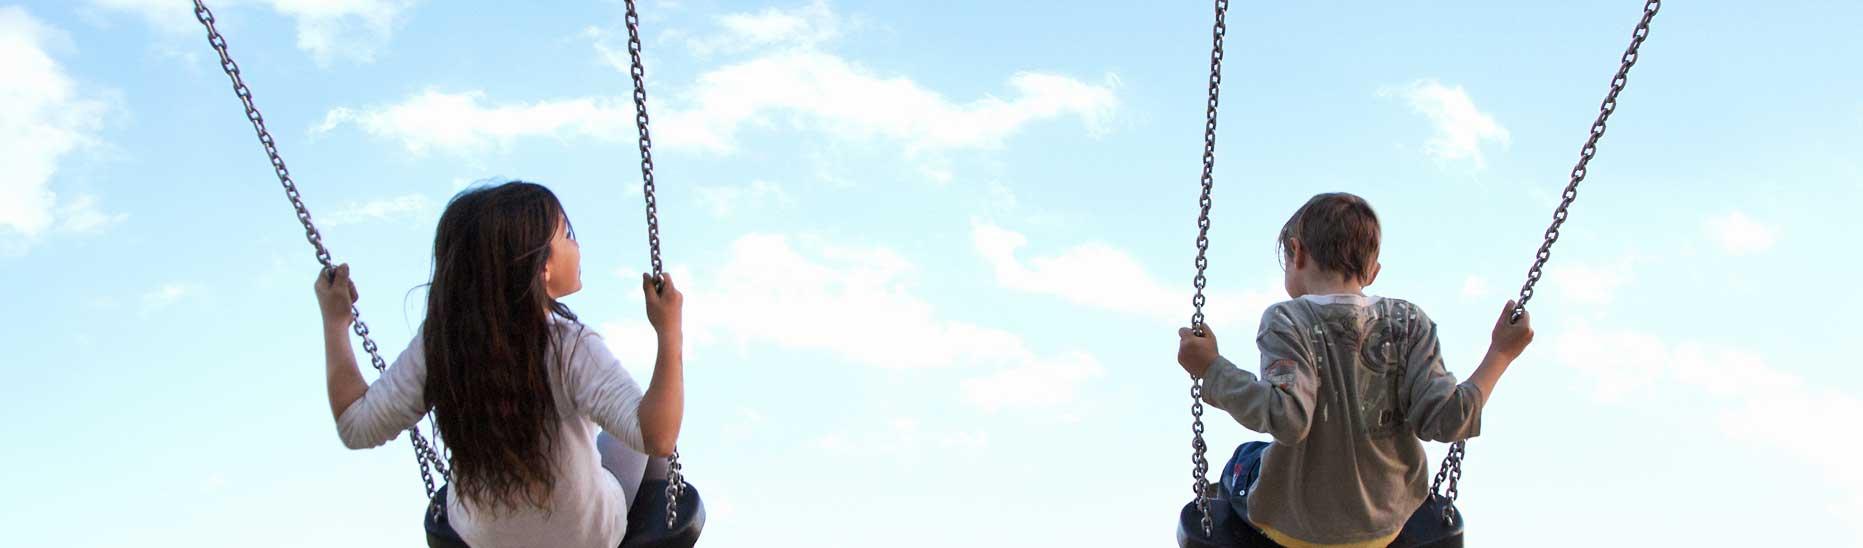 2 kids on swings